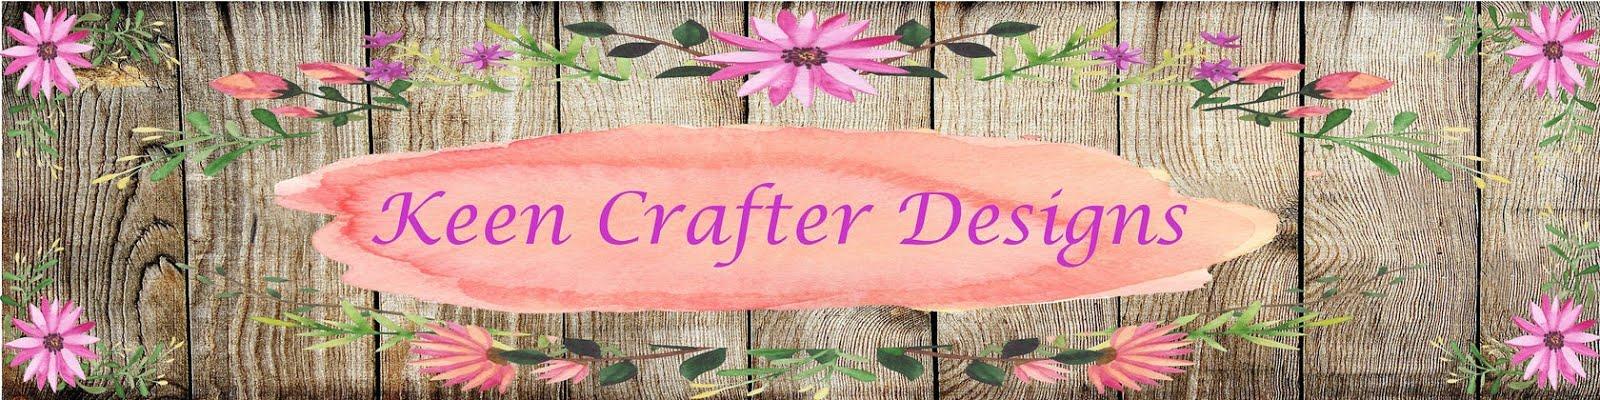 Keen Crafter Designs DT Member